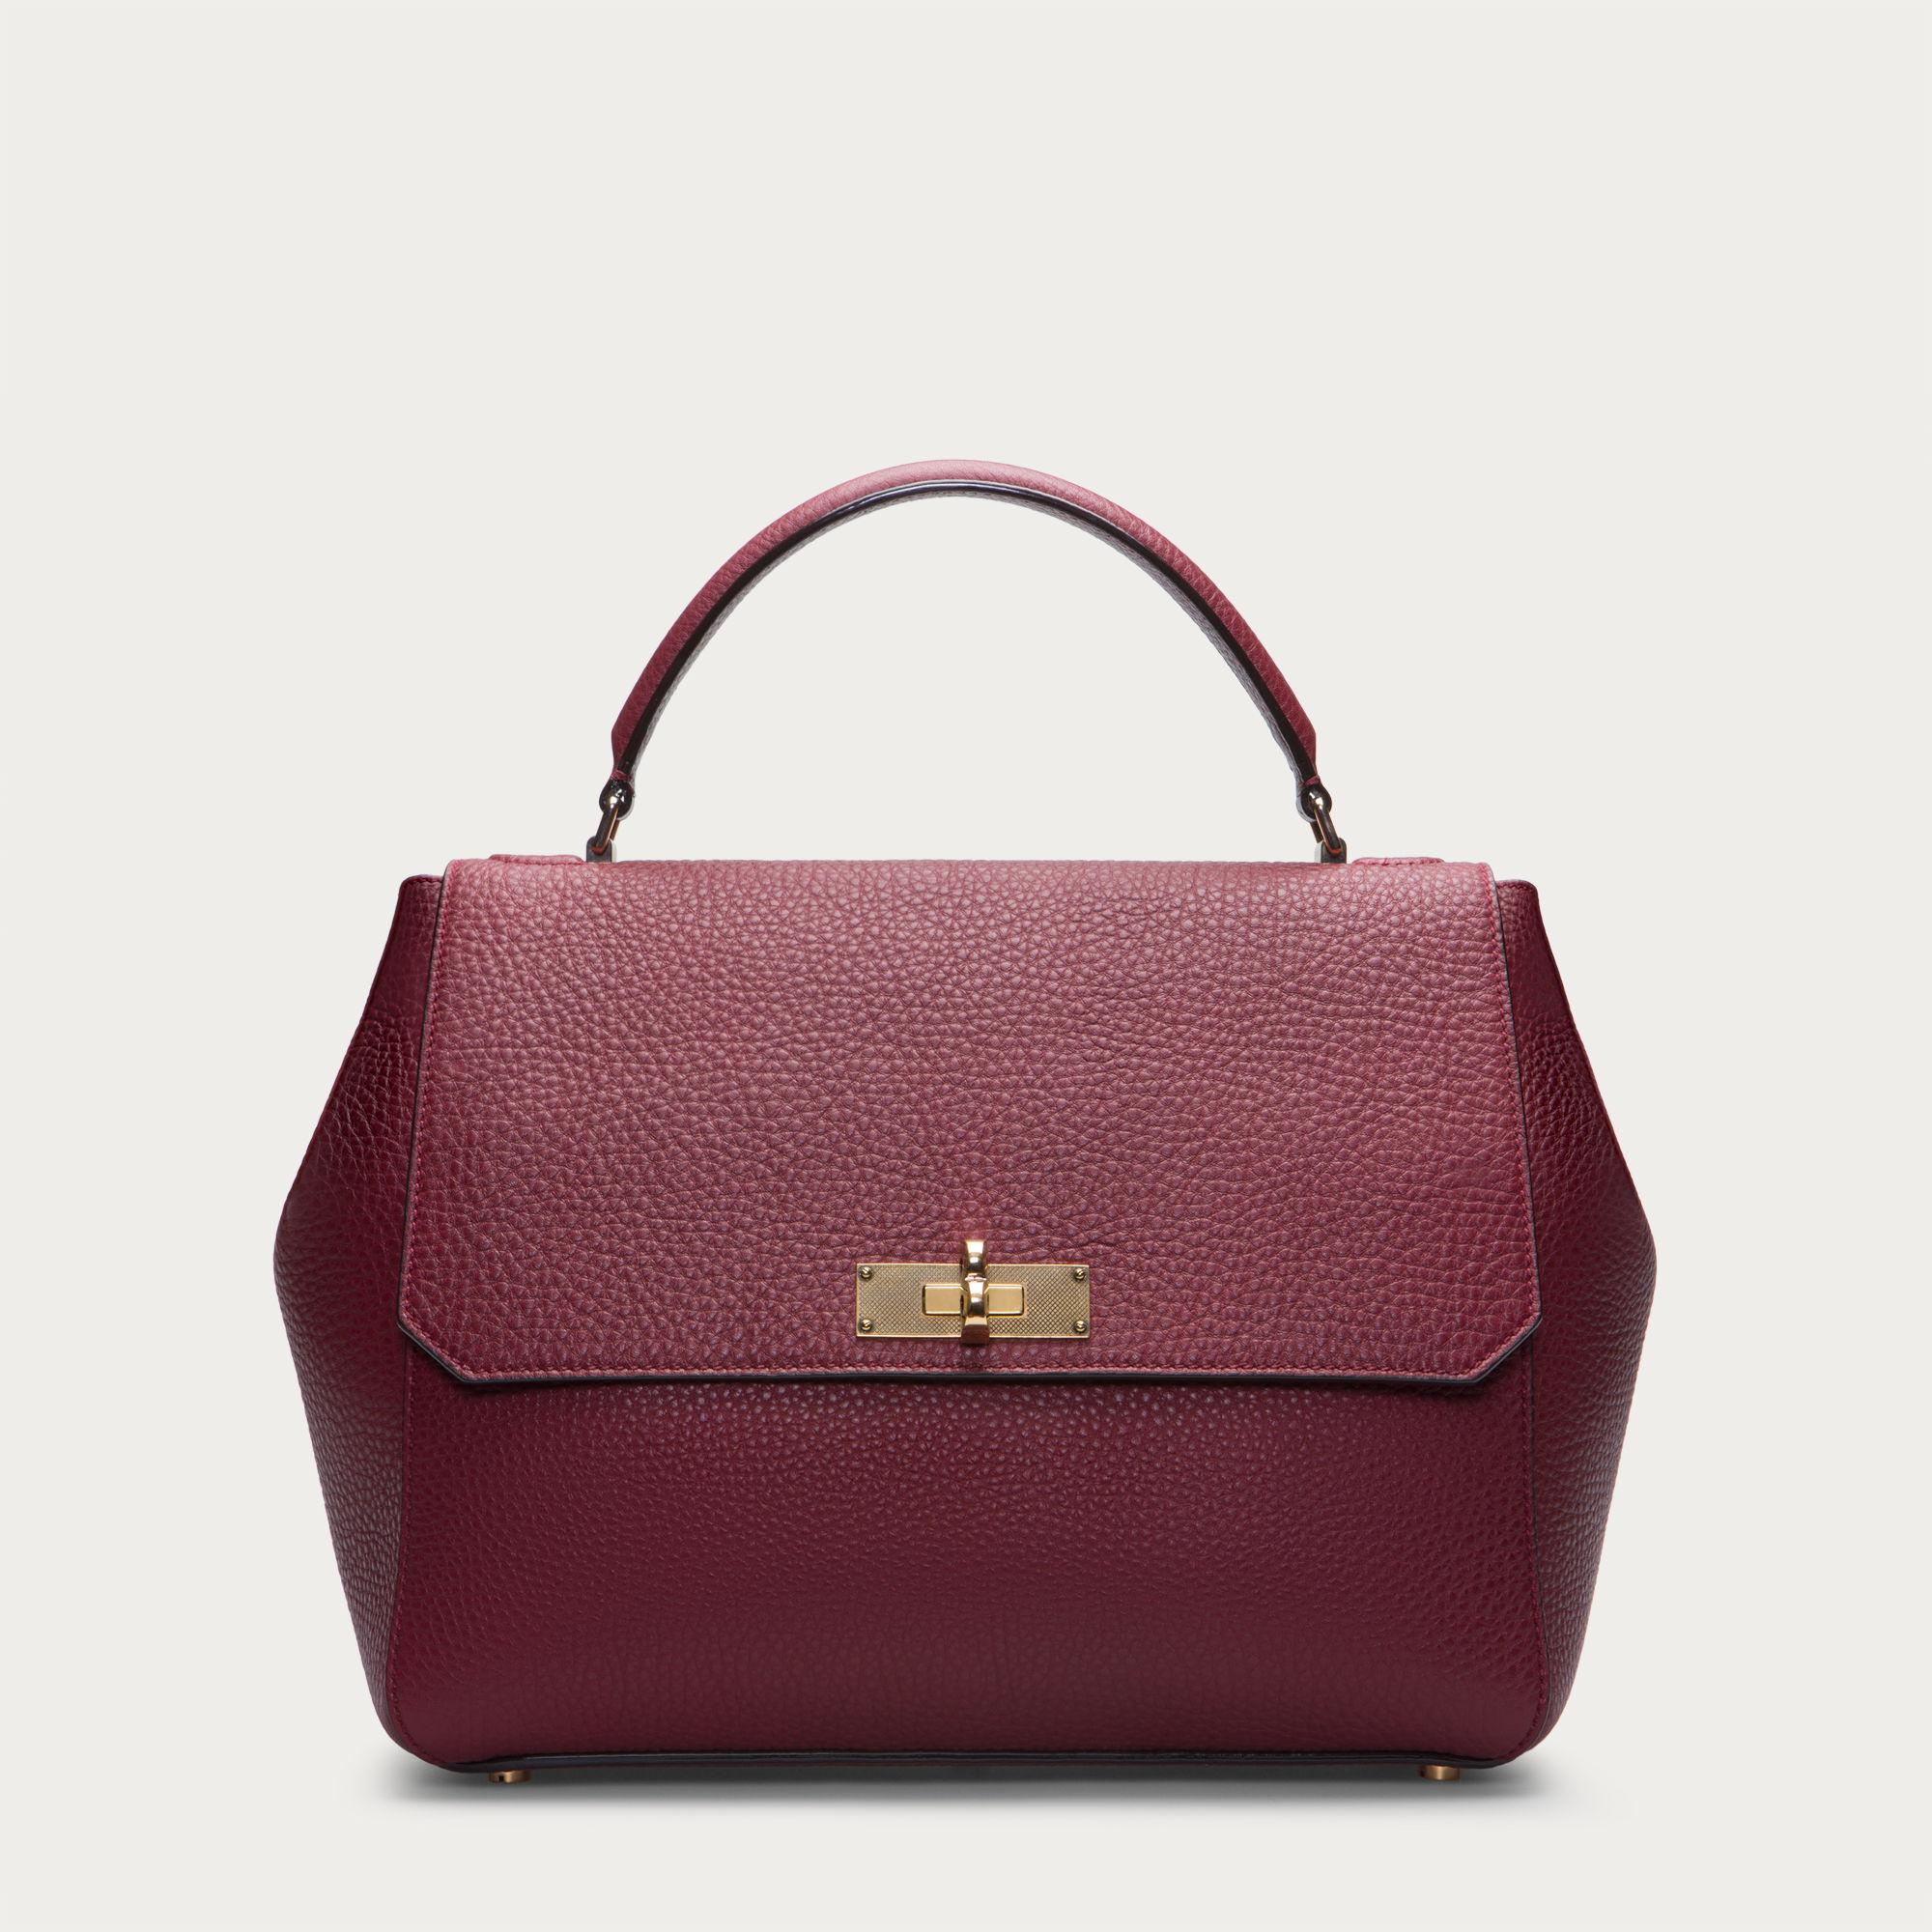 Simple  Bag Blackwhite Women Bags WOMEN64I6TV001MzYw0  36254  Bally